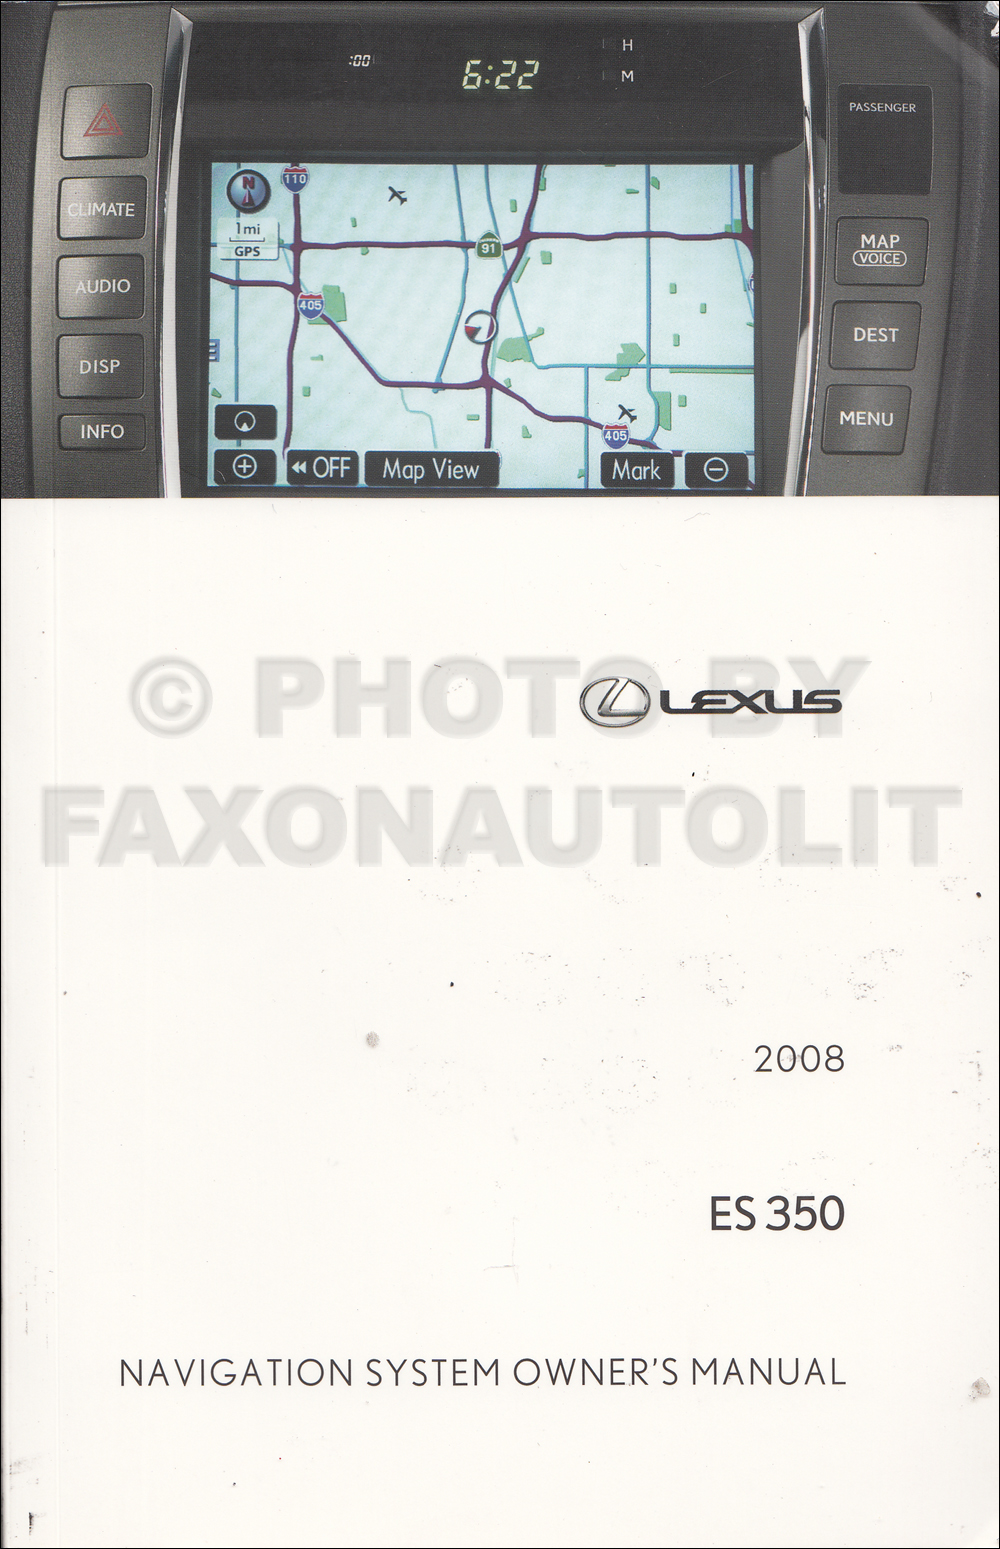 2008 lexus es 350 navigation system owners manual original rh faxonautoliterature com 2008 lexus es 350 owners manual download 2008 lexus es 350 owners manual pdf